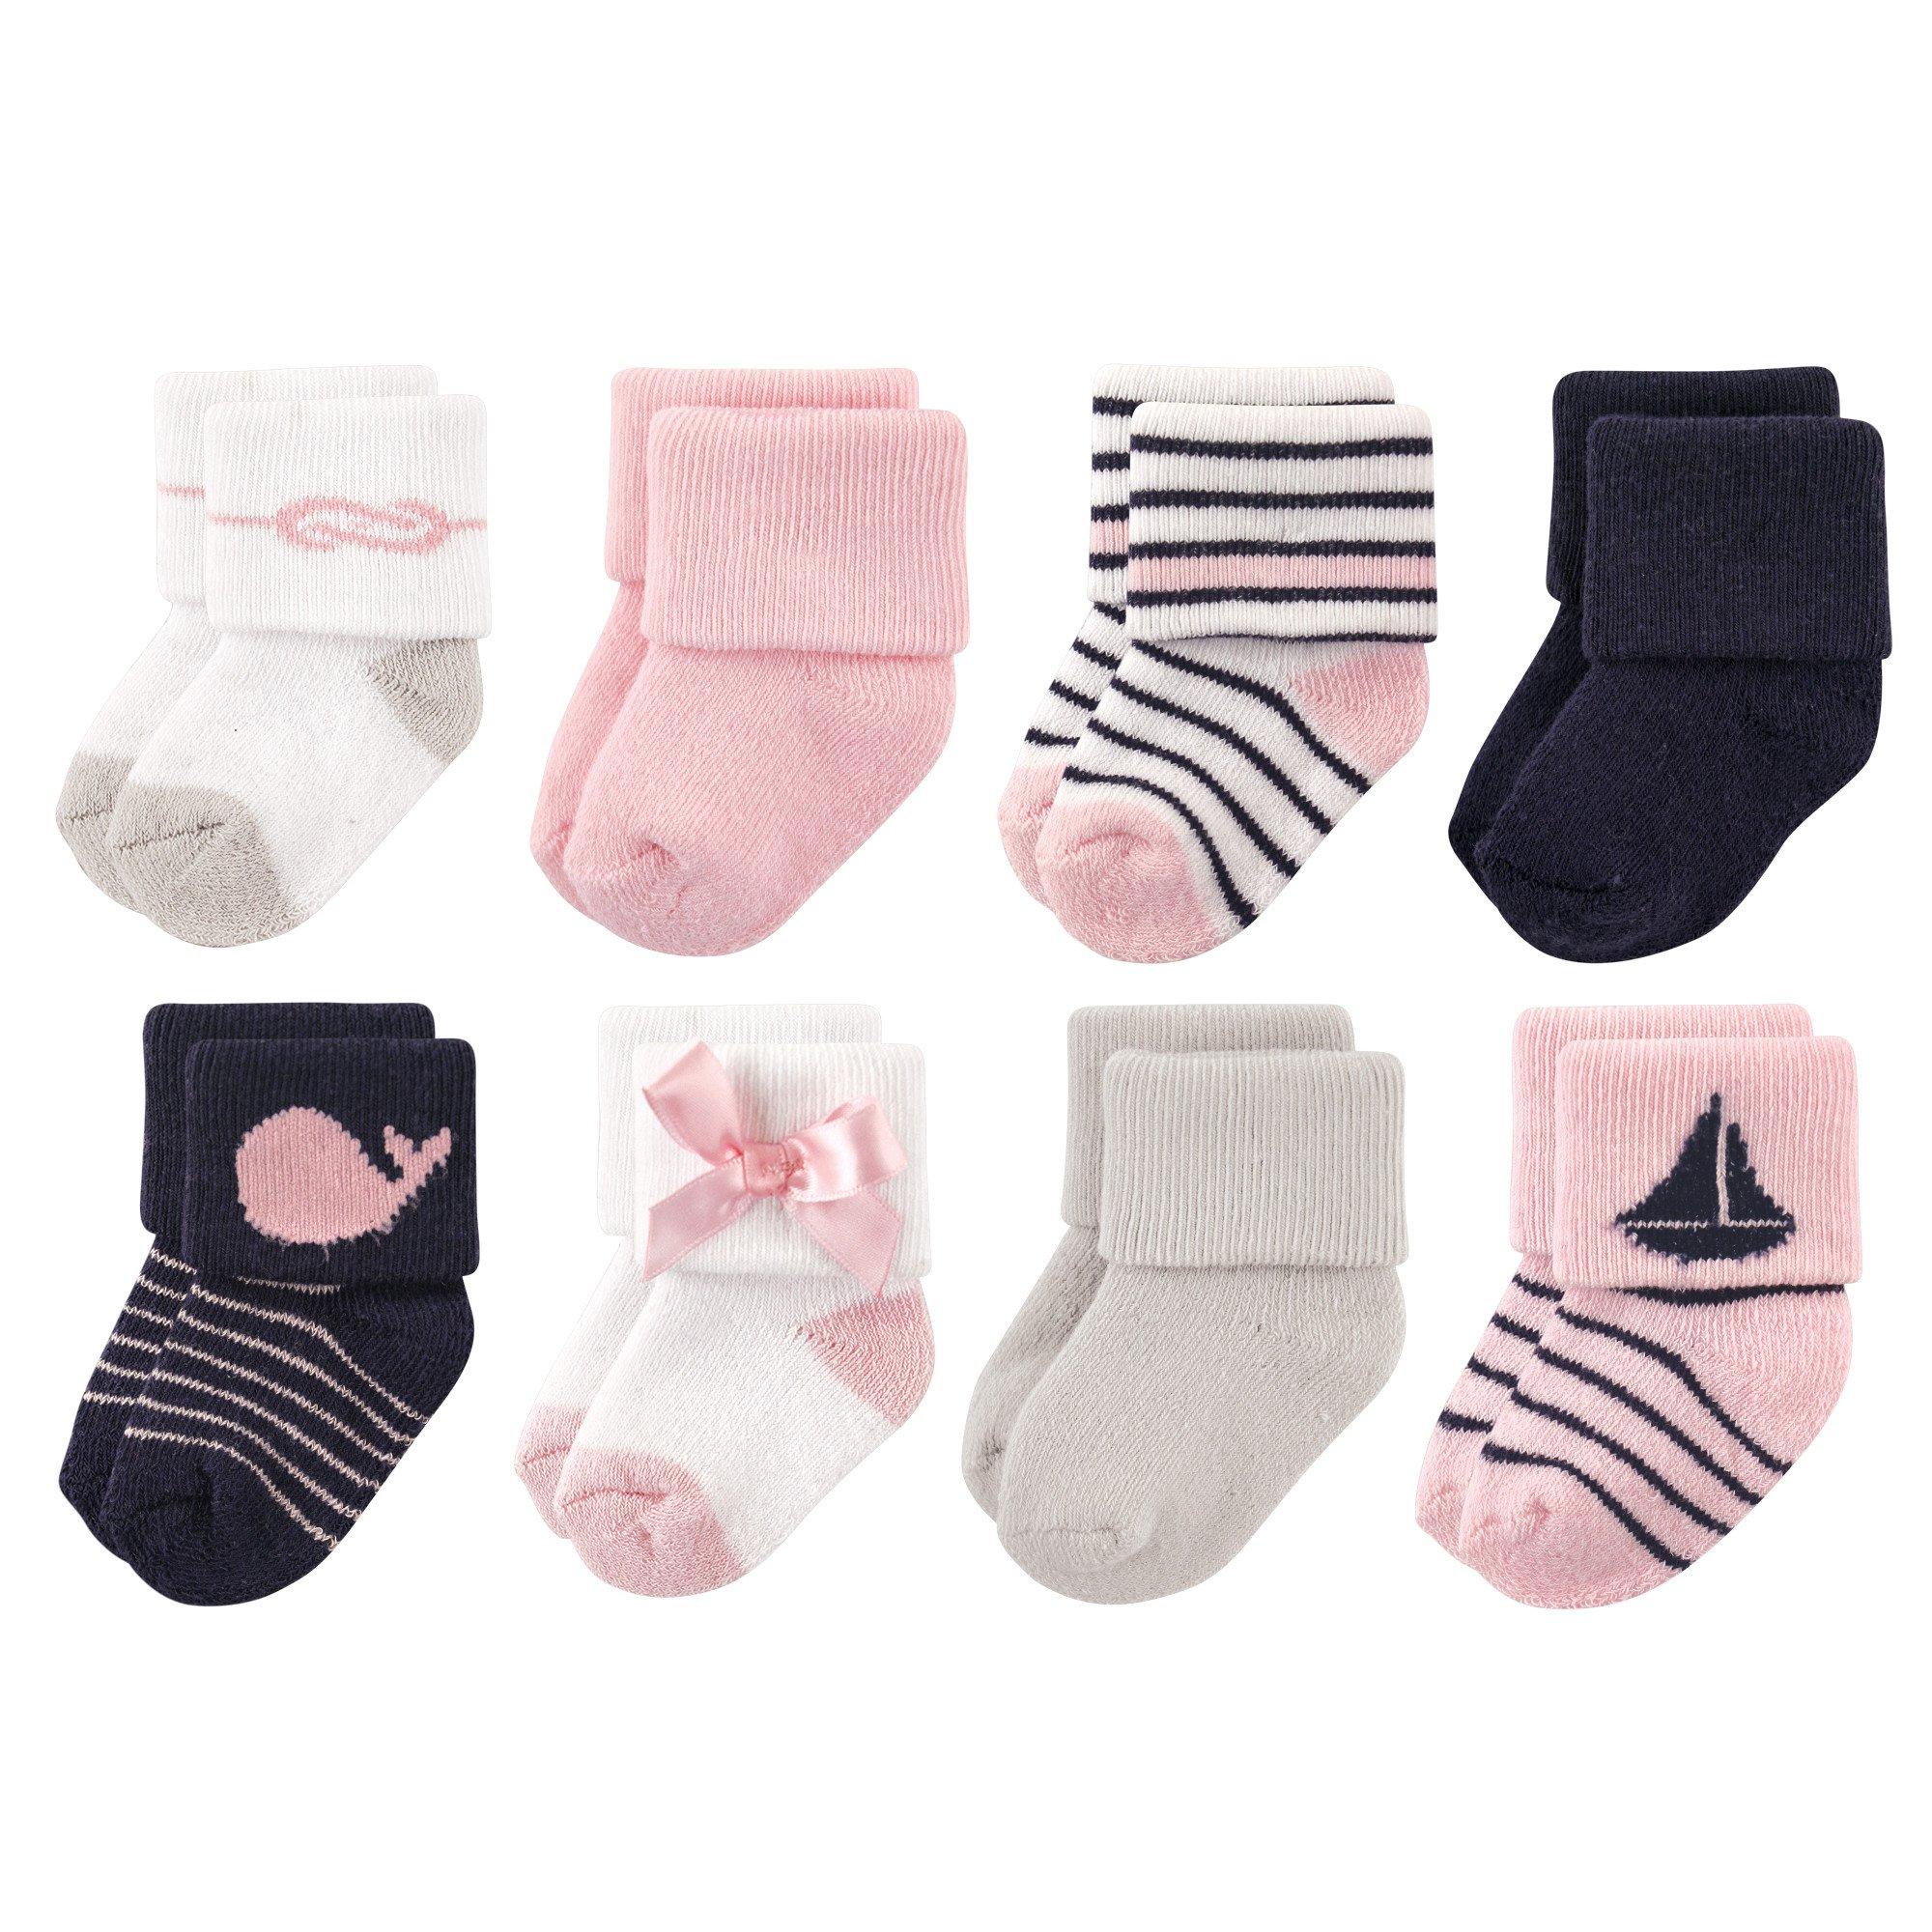 Luvable Friends Unisex Baby Socks, Girl Sailboat 8-Pack, 0-6 Months